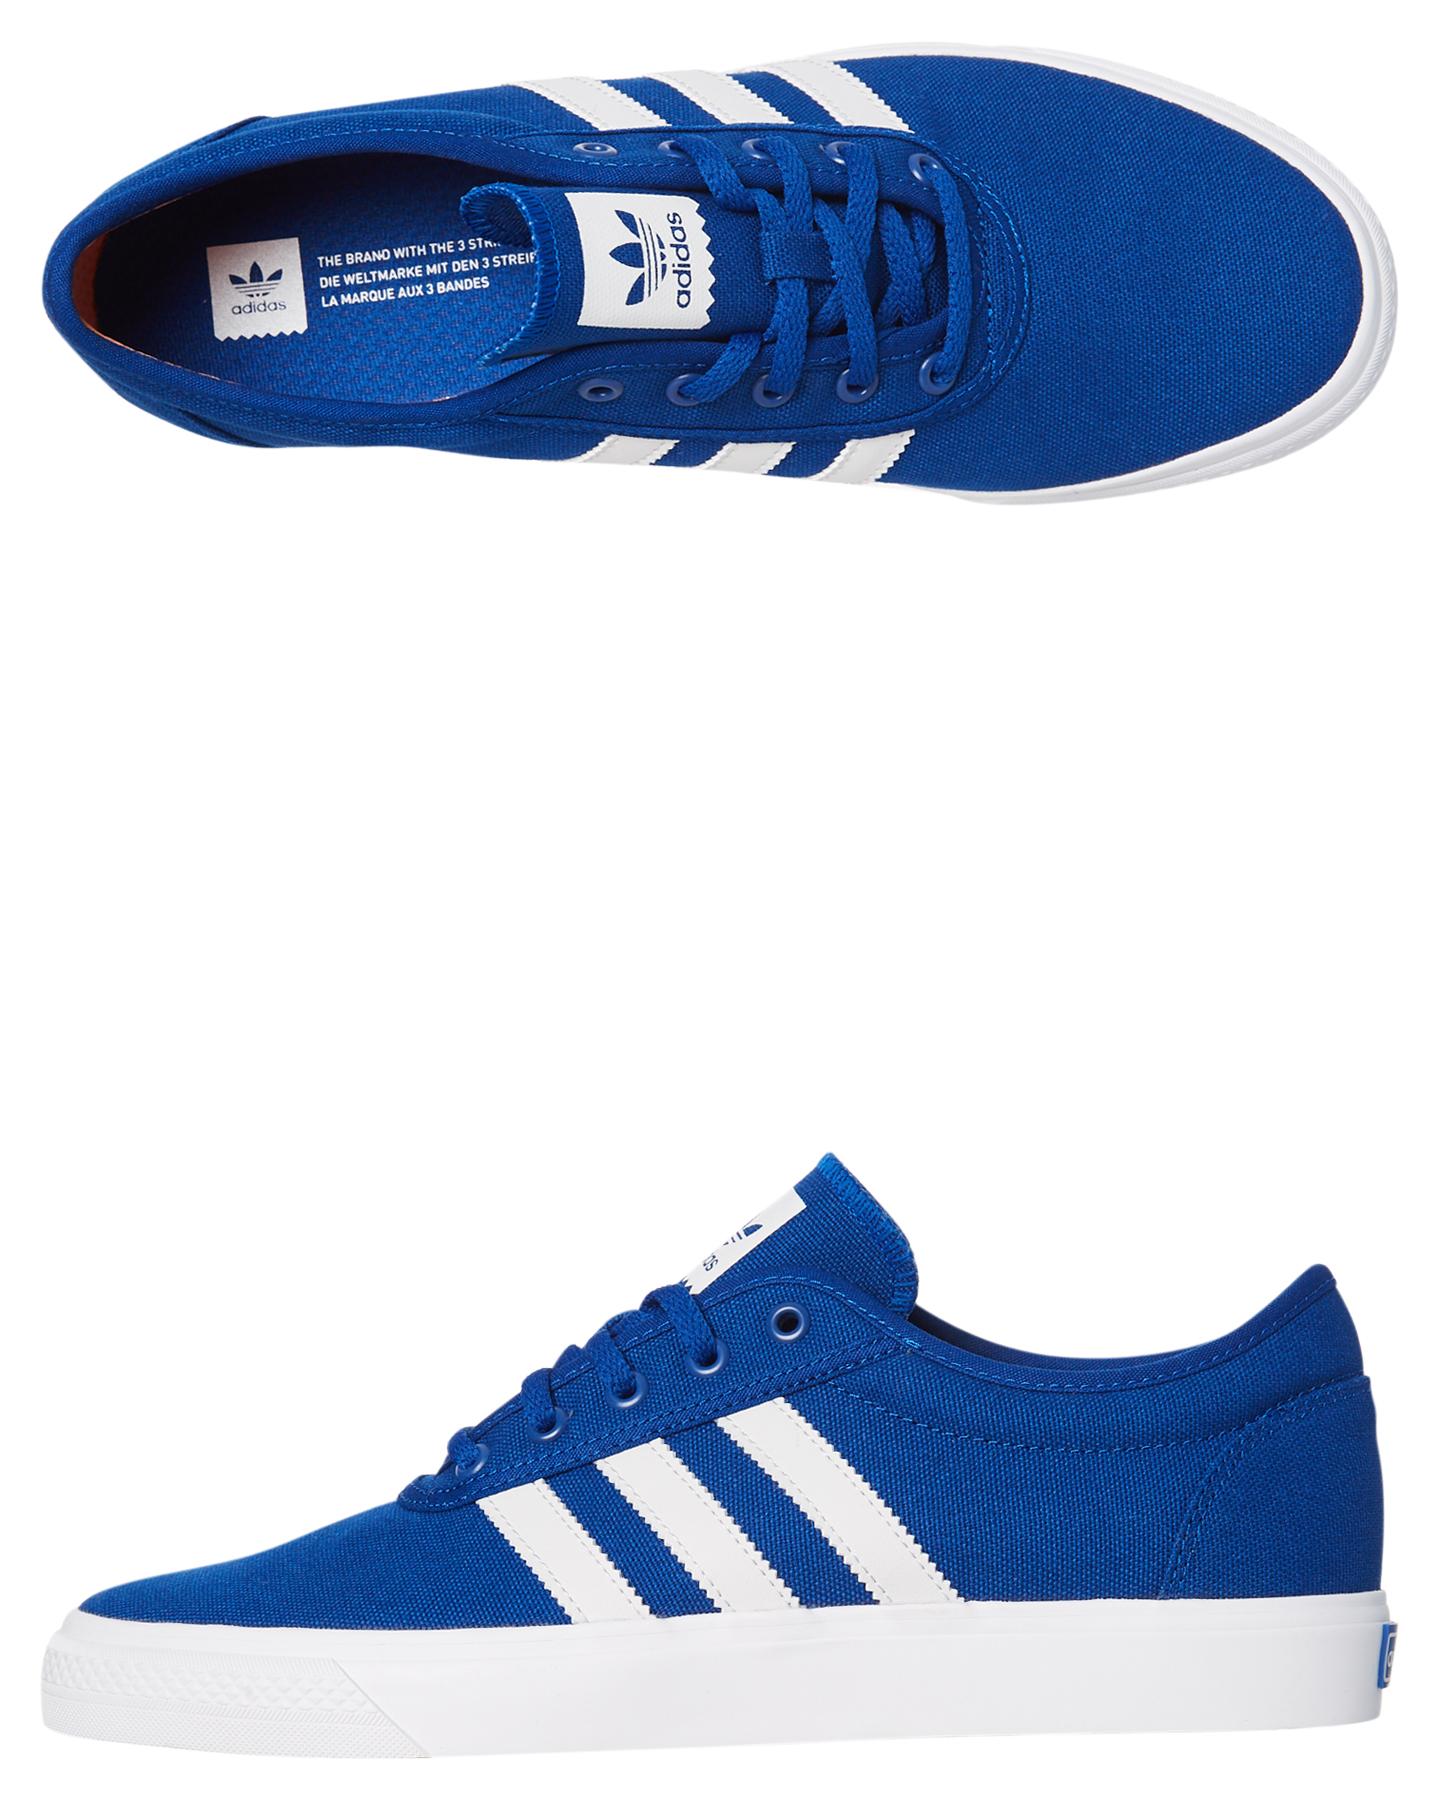 reputable site 365af d08ac Adidas Mens Adi Ease Shoe Collegiate Royal Collegiate Royal